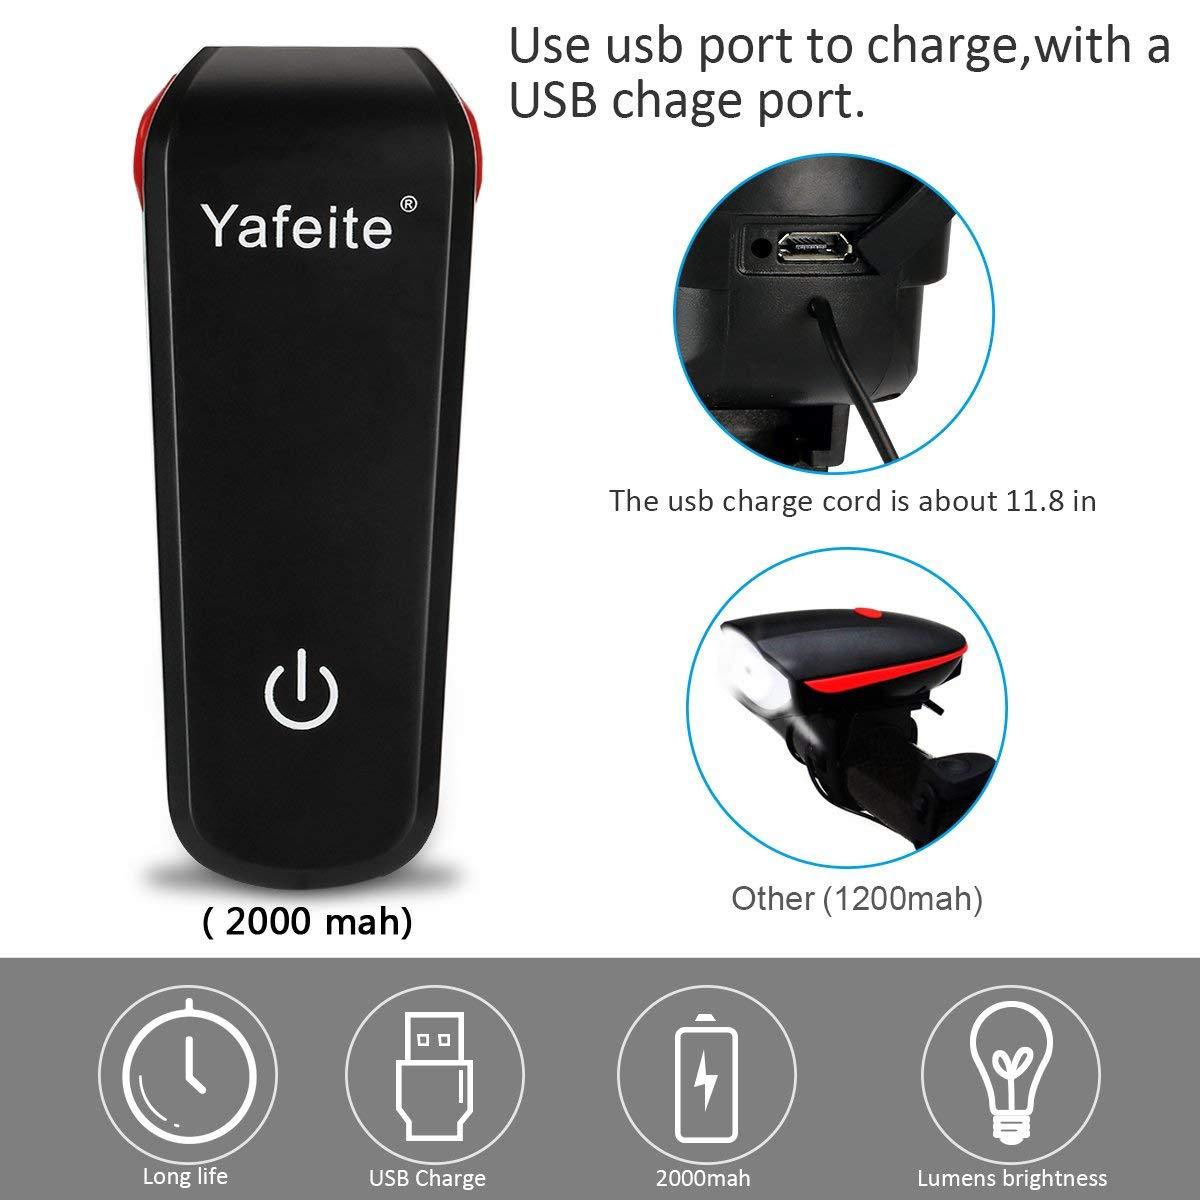 Yafeite Bike Light,Bicycle Headlight USB Rechargeable LED Bike Light Set 350 Lumens Super Bright Touch Switch Waterproof,Kids Adult Road Bike Safety Flashlight